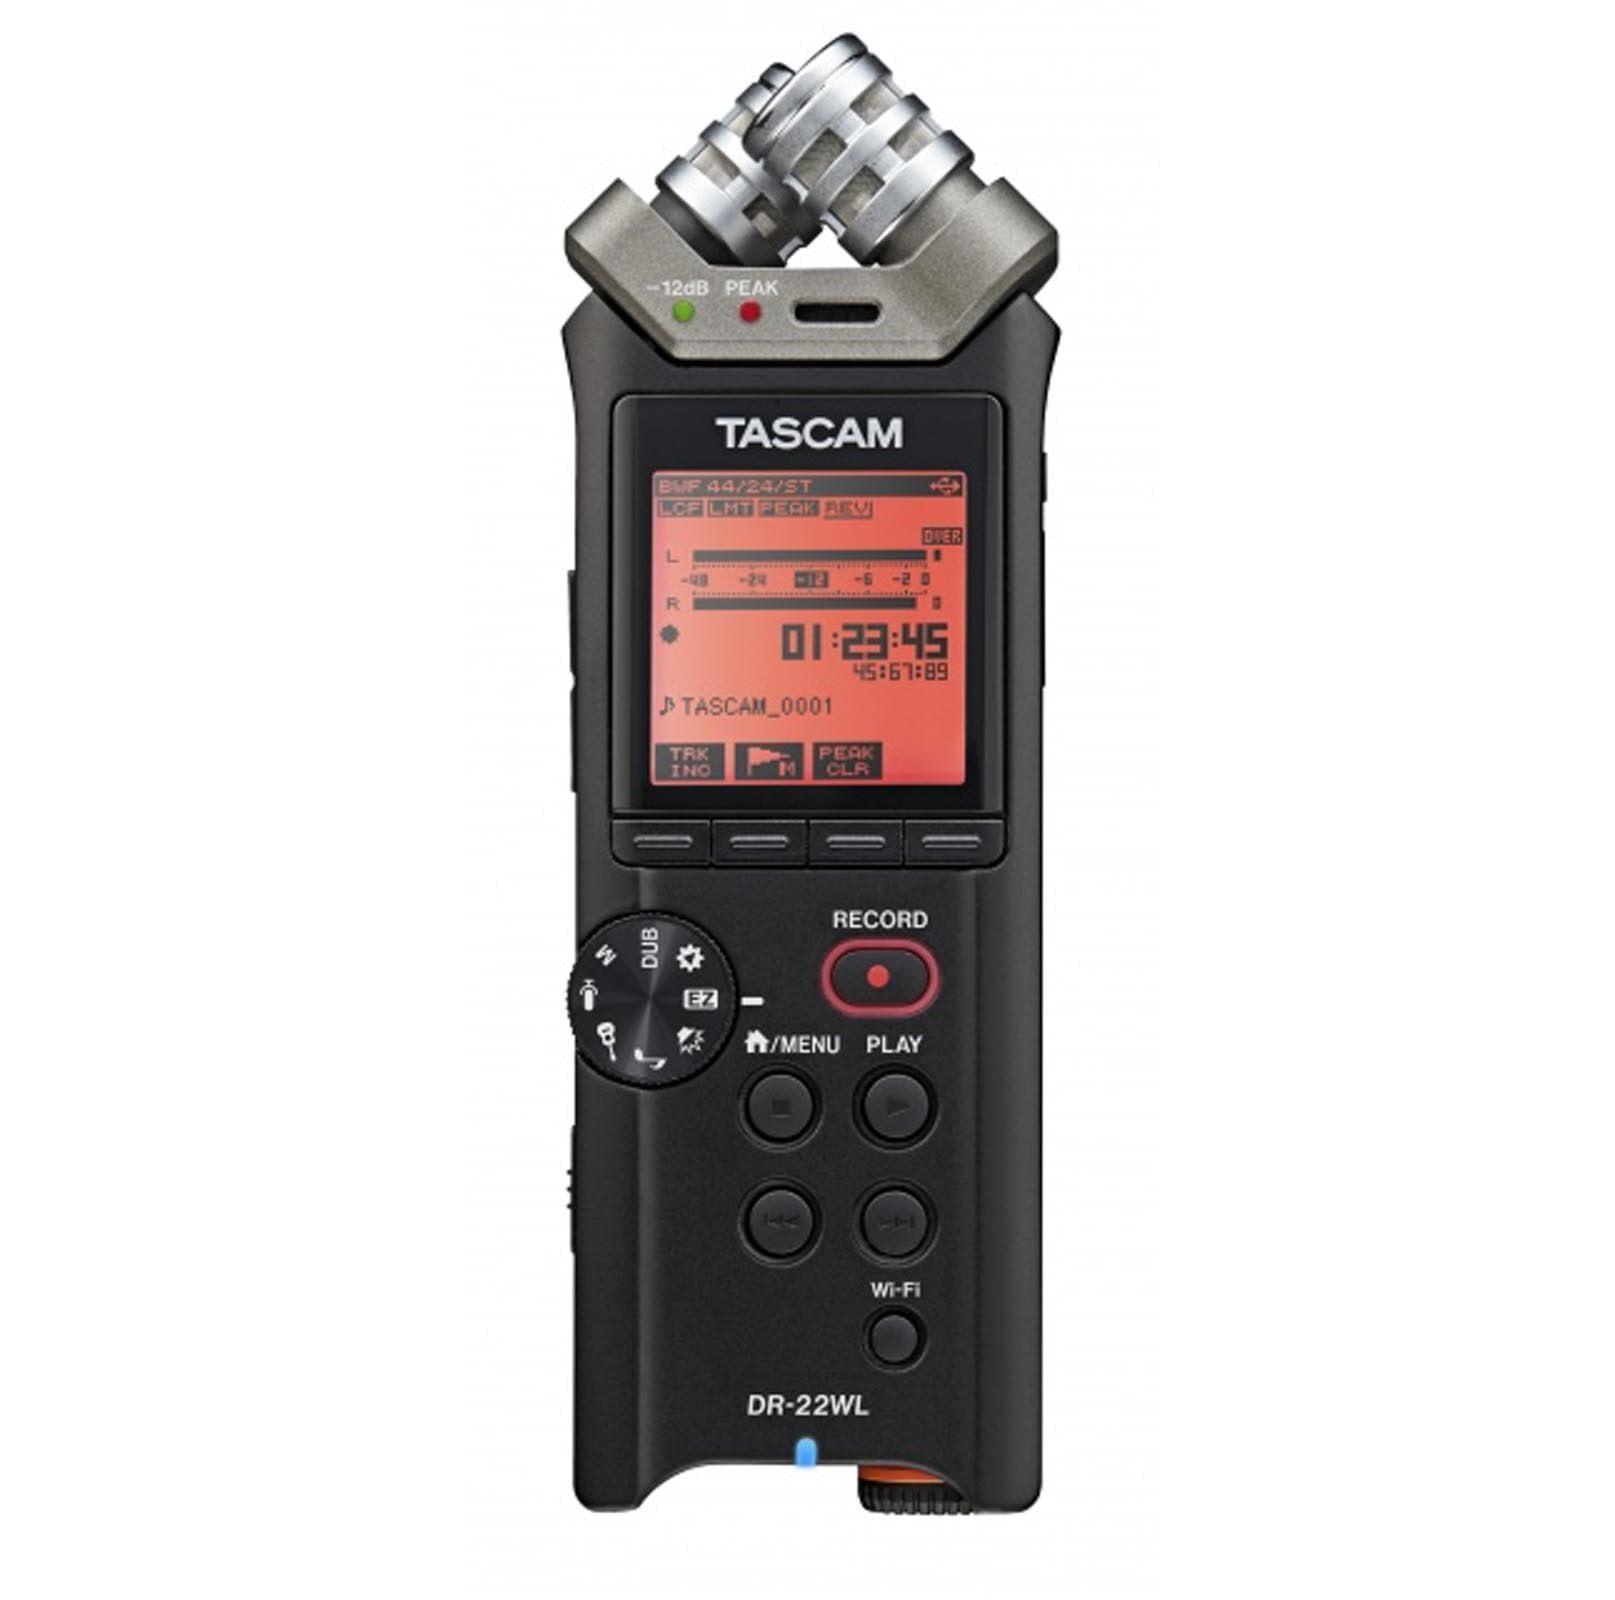 TASCAM DR-22WL 2 Channel Handheld Portable Wi-Fi Studio Recorder w/ 4GB SD Card